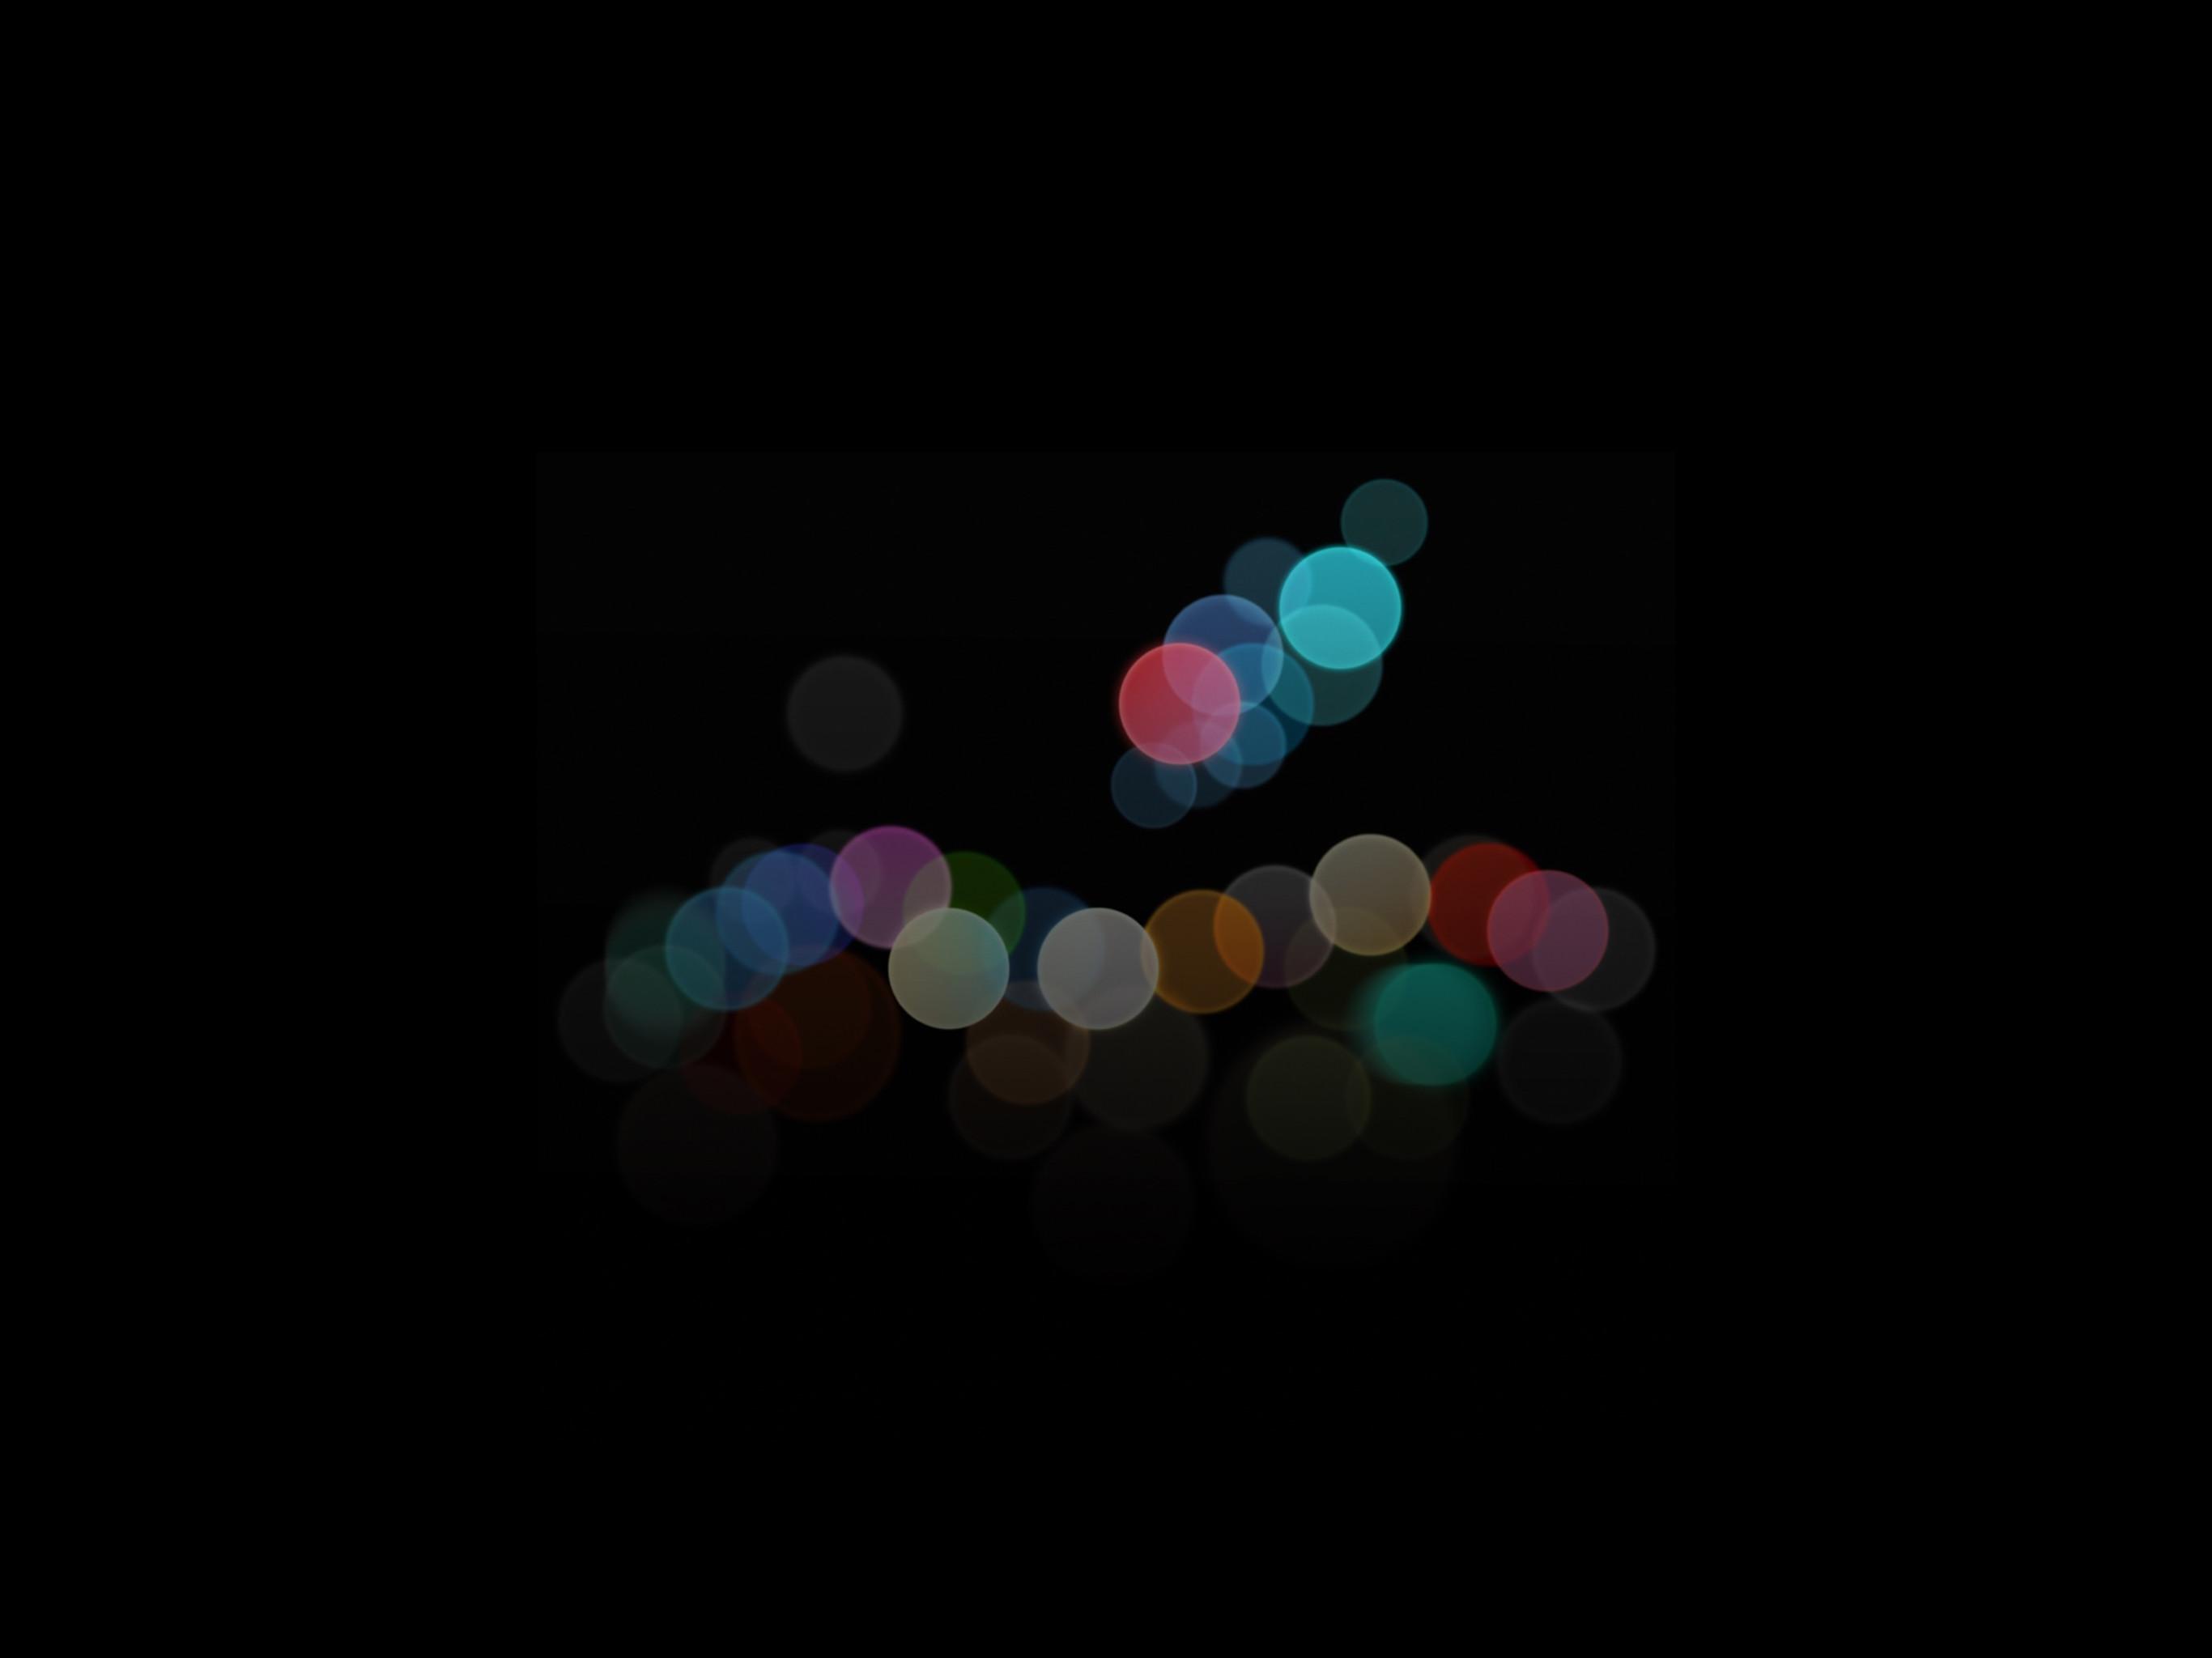 Res: 2732x2048, September 17 Apple Media Event iPad Pro